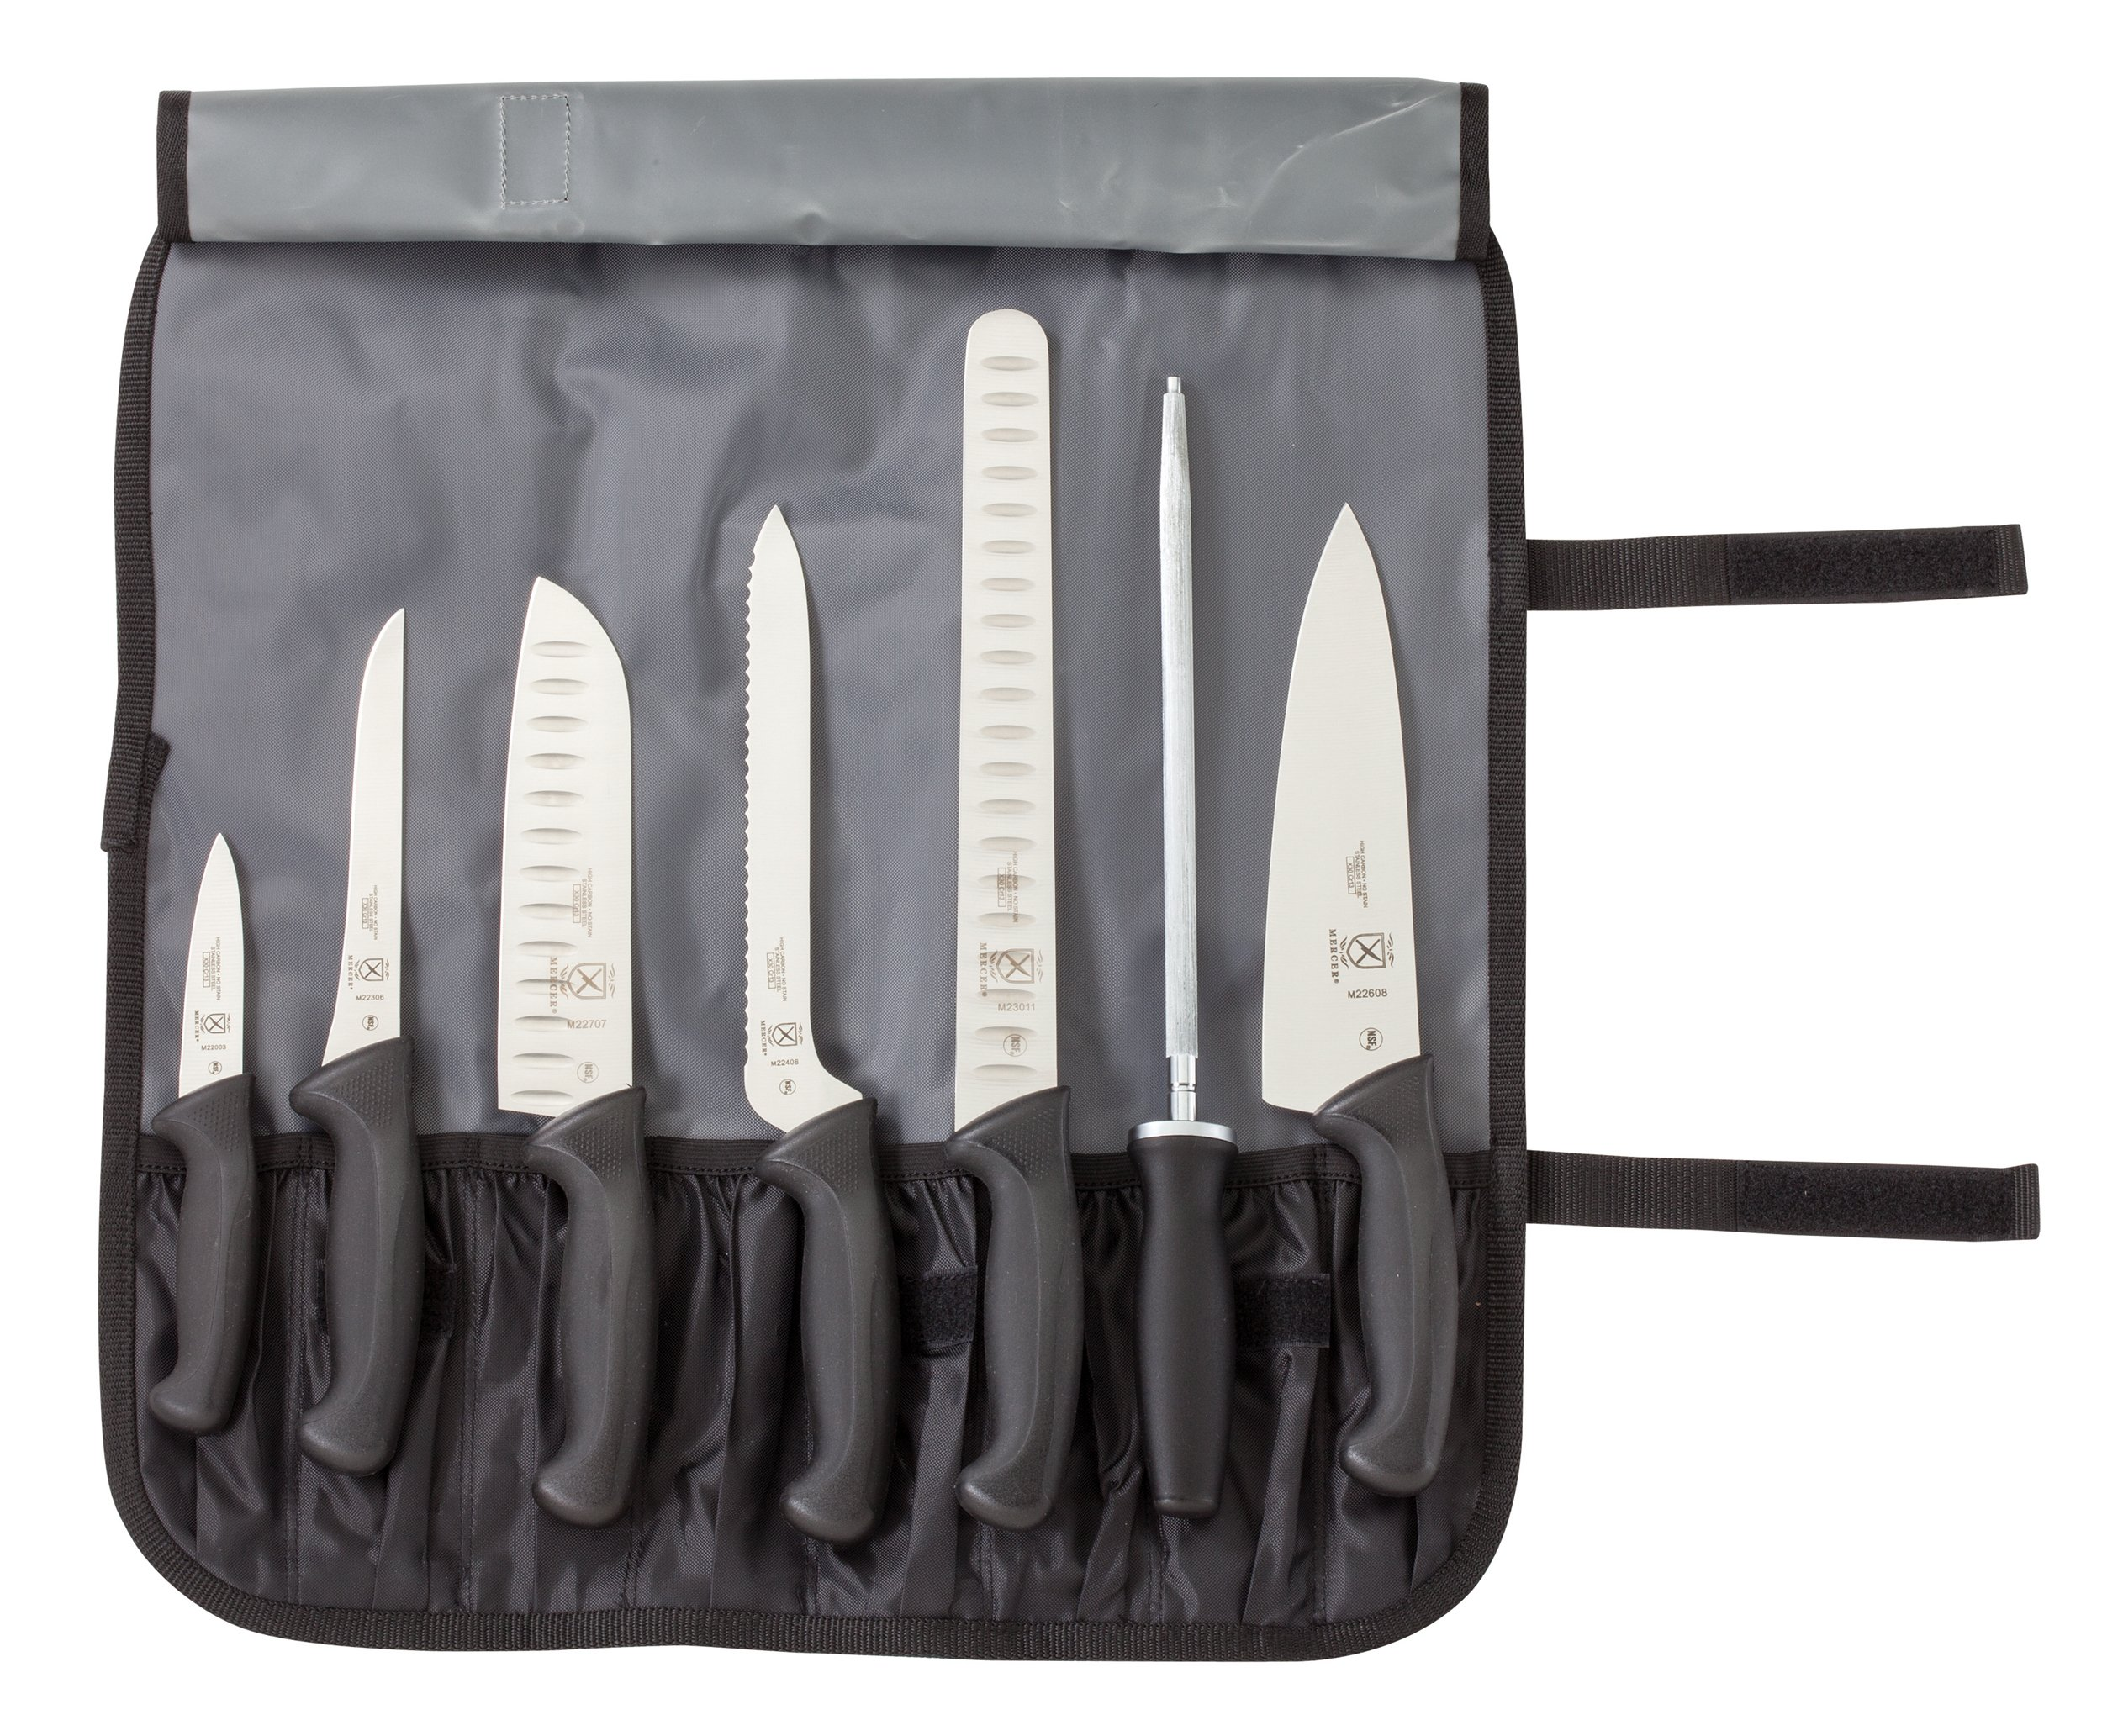 Mercer Culinary Millennia 8 Piece Knife